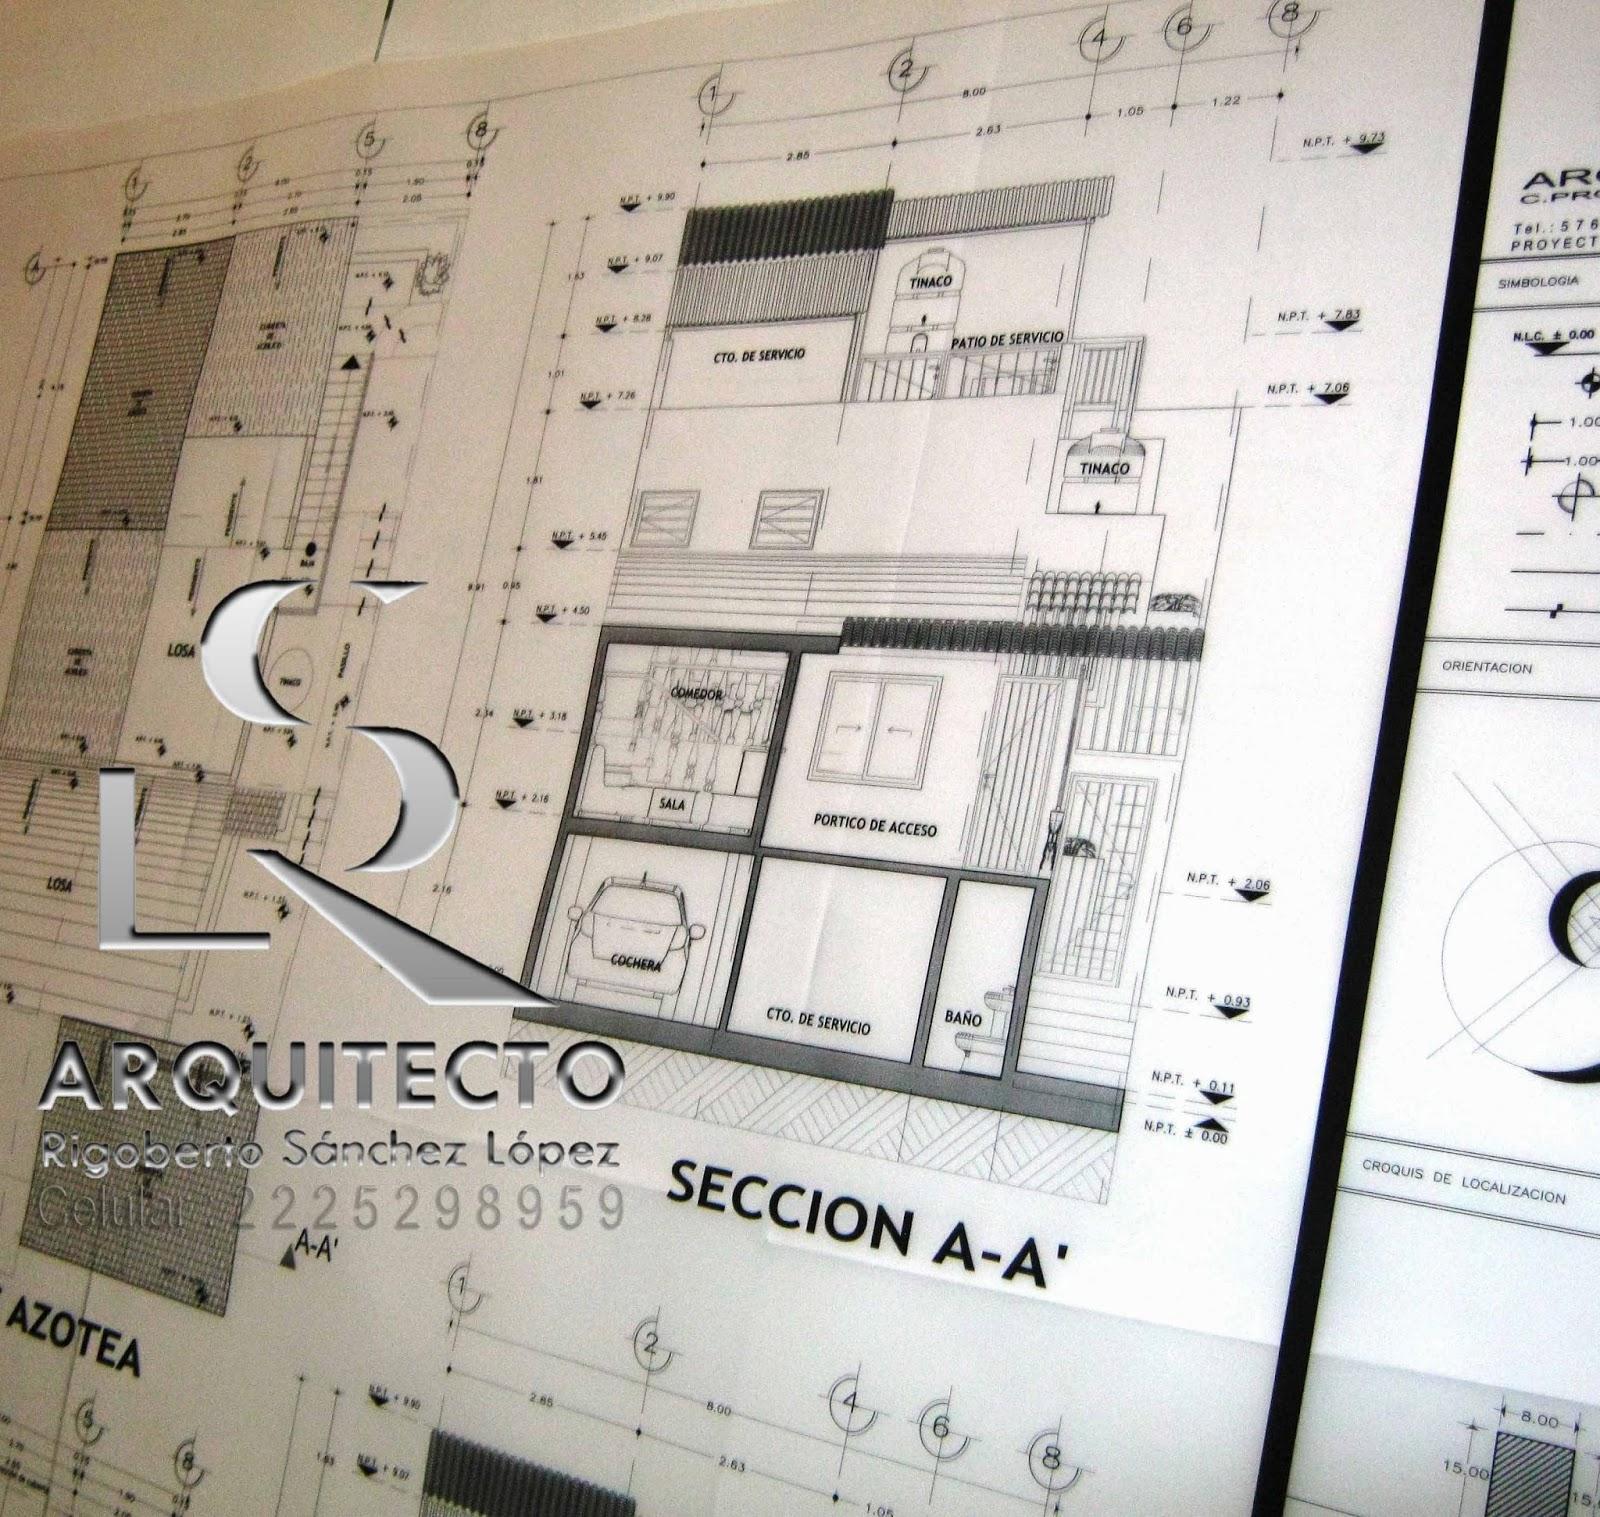 Planos basicos para construir casas for Ejes arquitectonicos